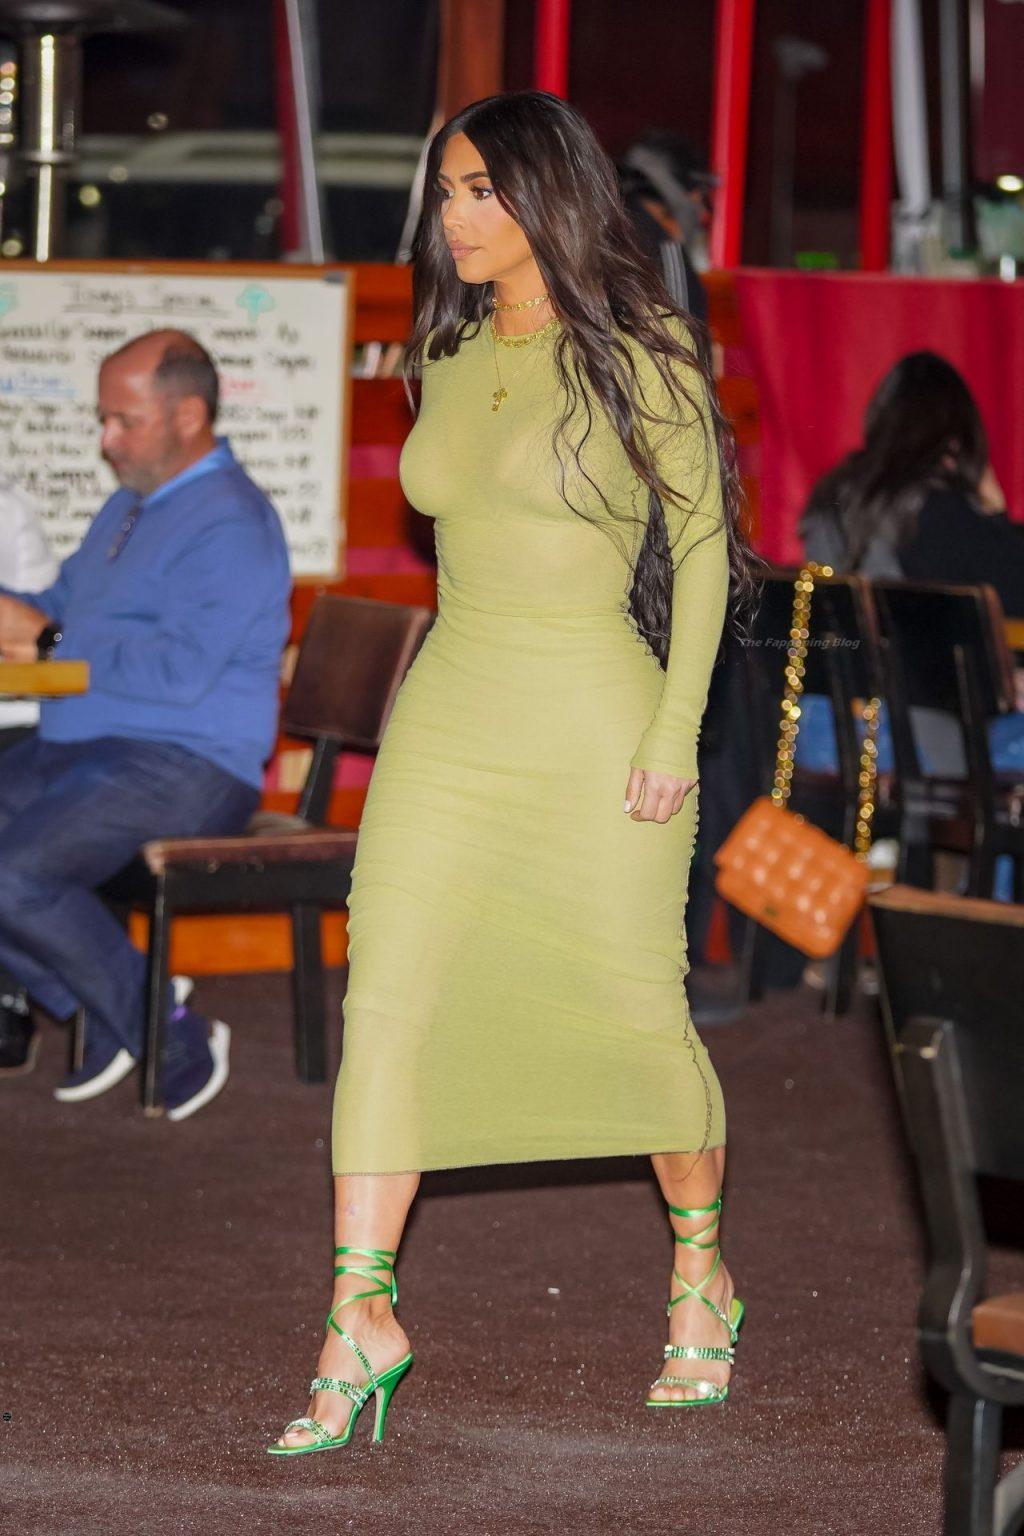 Kim Kardashian Enjoys a Ladies Night with Kourtney, La La Anthony After Filing For Divorce (51 Photos)